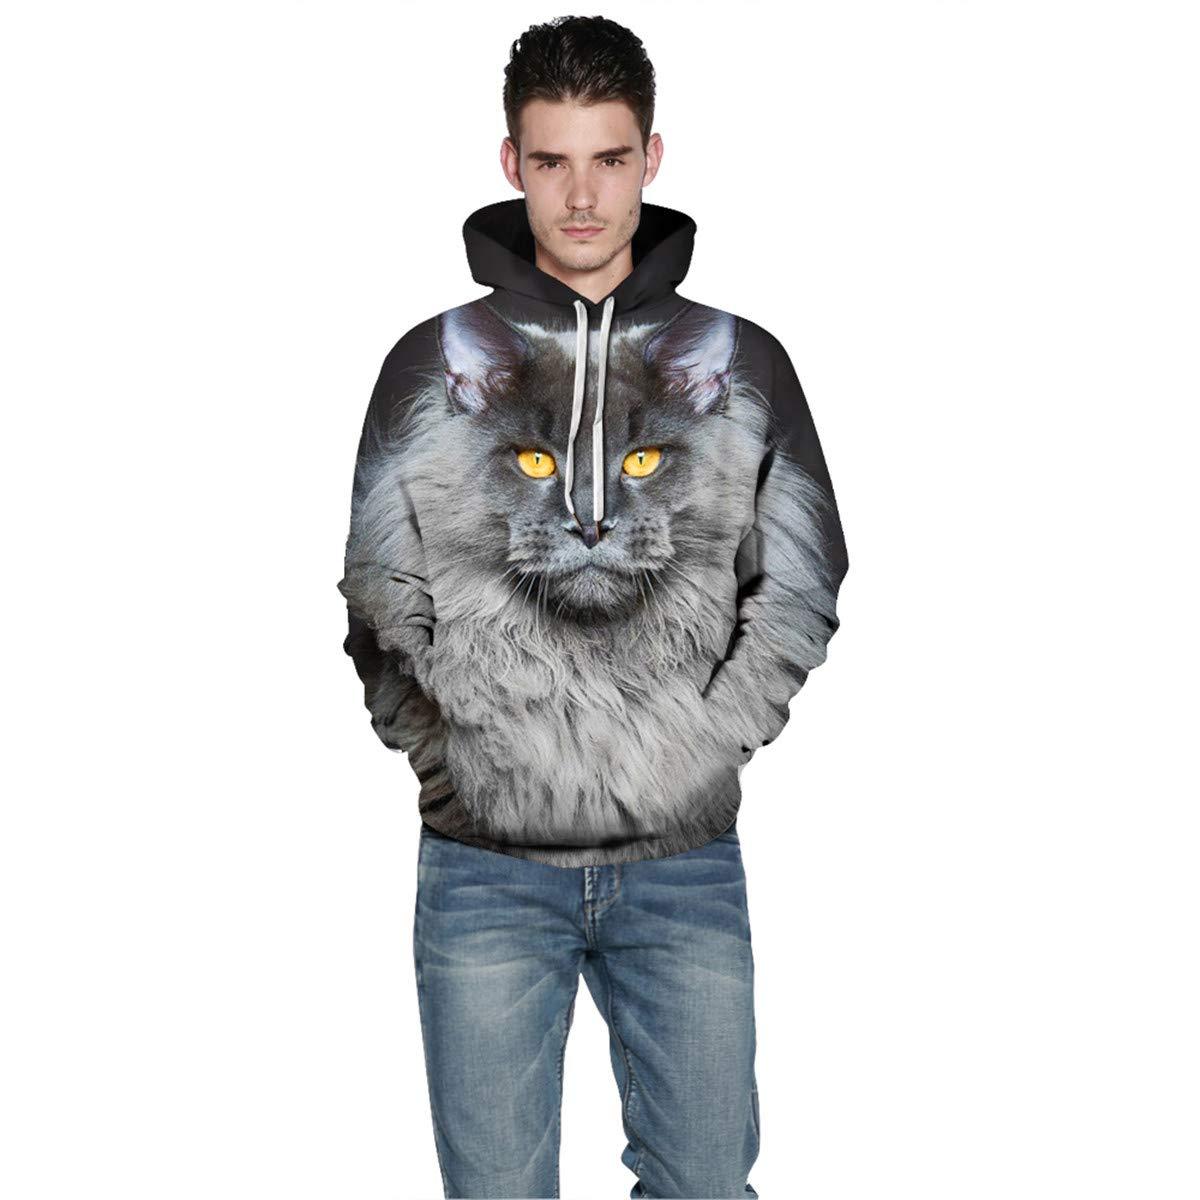 Mens Hooded Long Sleeve 3D Digital Print Cat Heads Couple Pullover Hoodies Fashion Hoodies Baseball Outwear